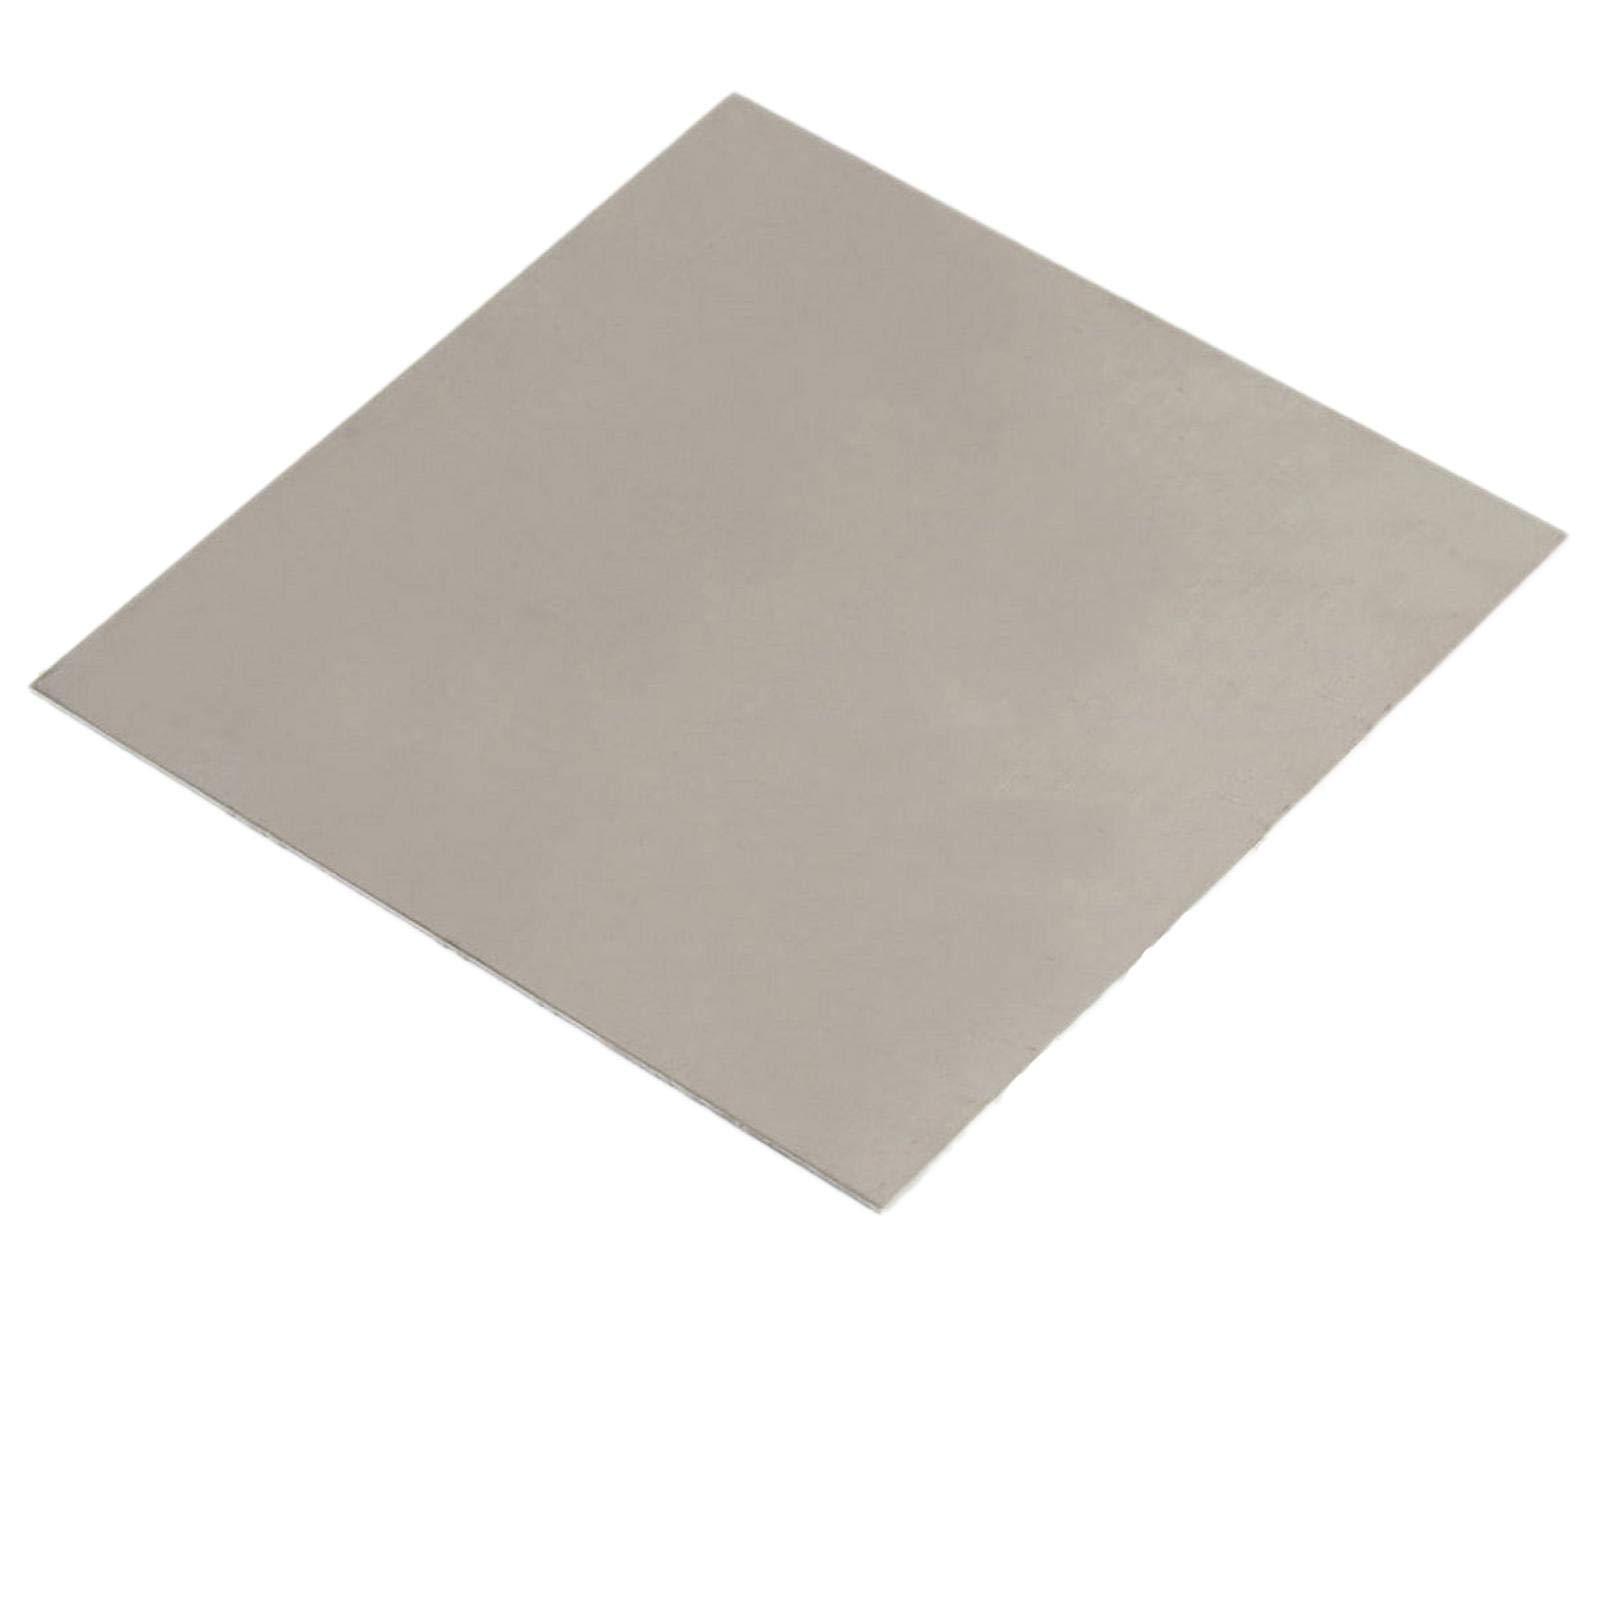 1.5mm x 200mm x 200mm Titanium Plate Ti Titan TC4 Gr5 Plate Sheet Foil by Yodaoke